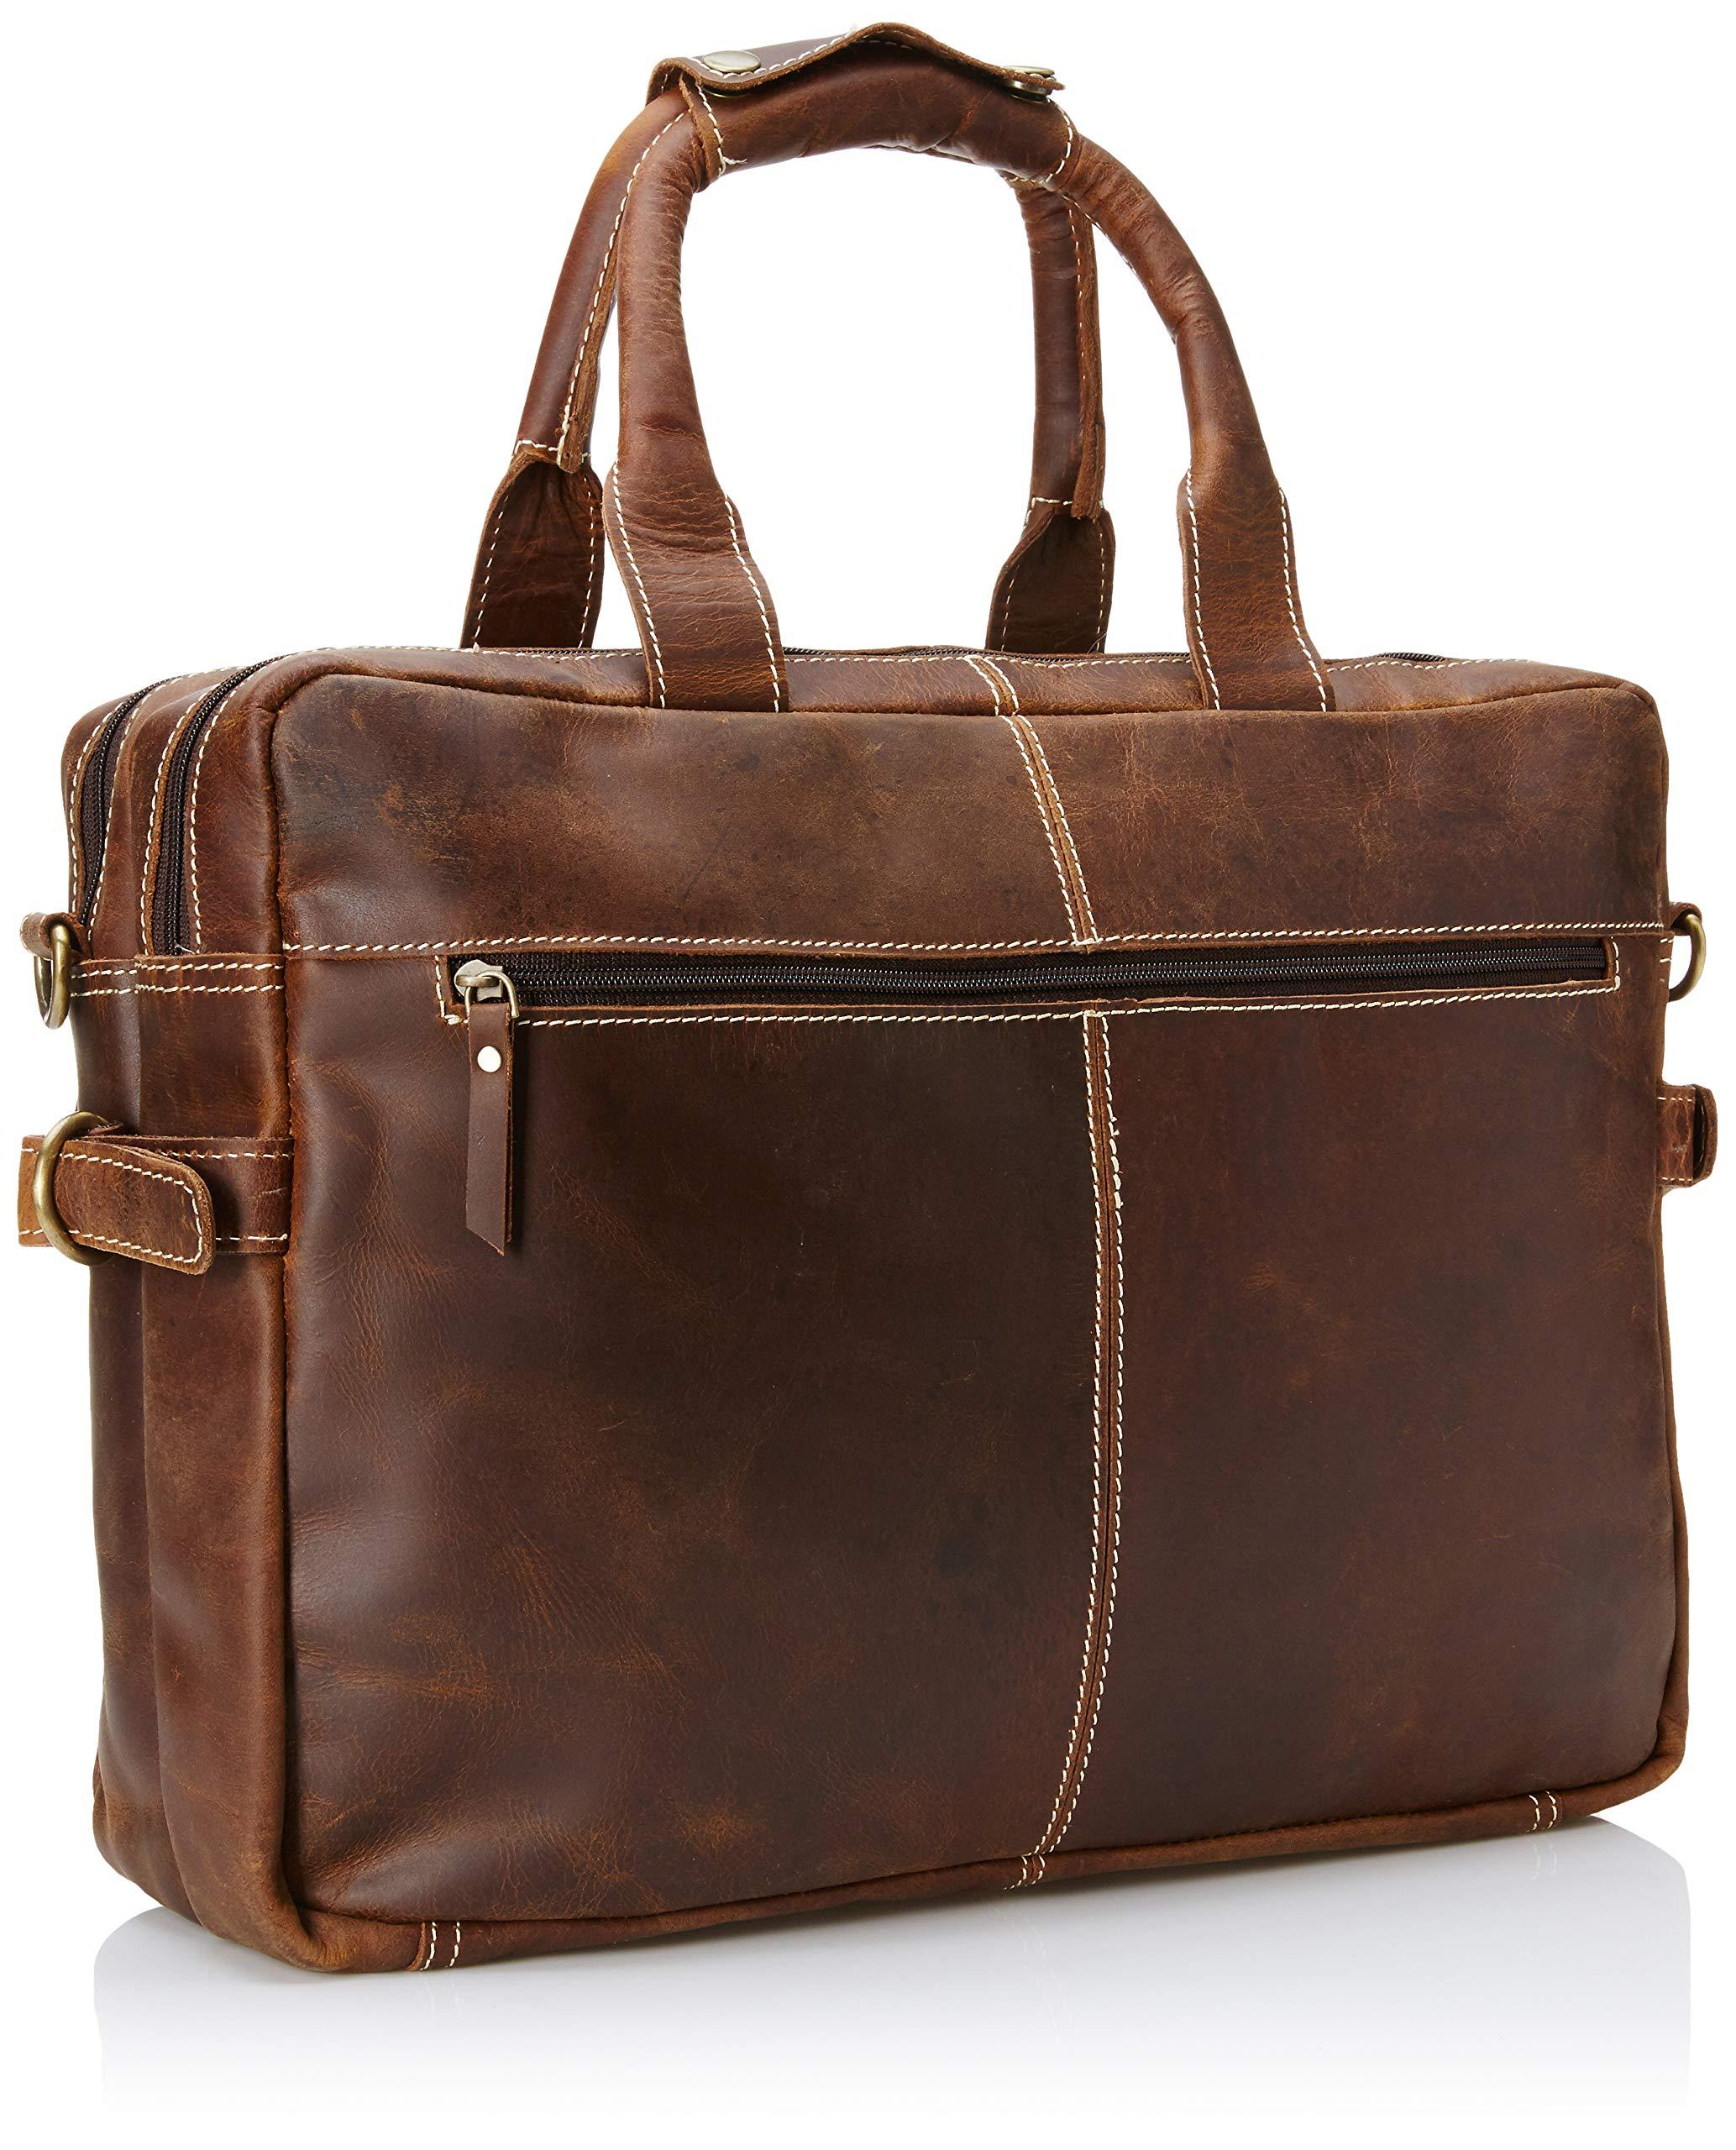 16 inch Vintage Buffalo Leather Messenger Satchel Laptop Briefcase Men's Bag Crazy Vintage Leather Messenger (Brown) by Ruzioon (Image #2)